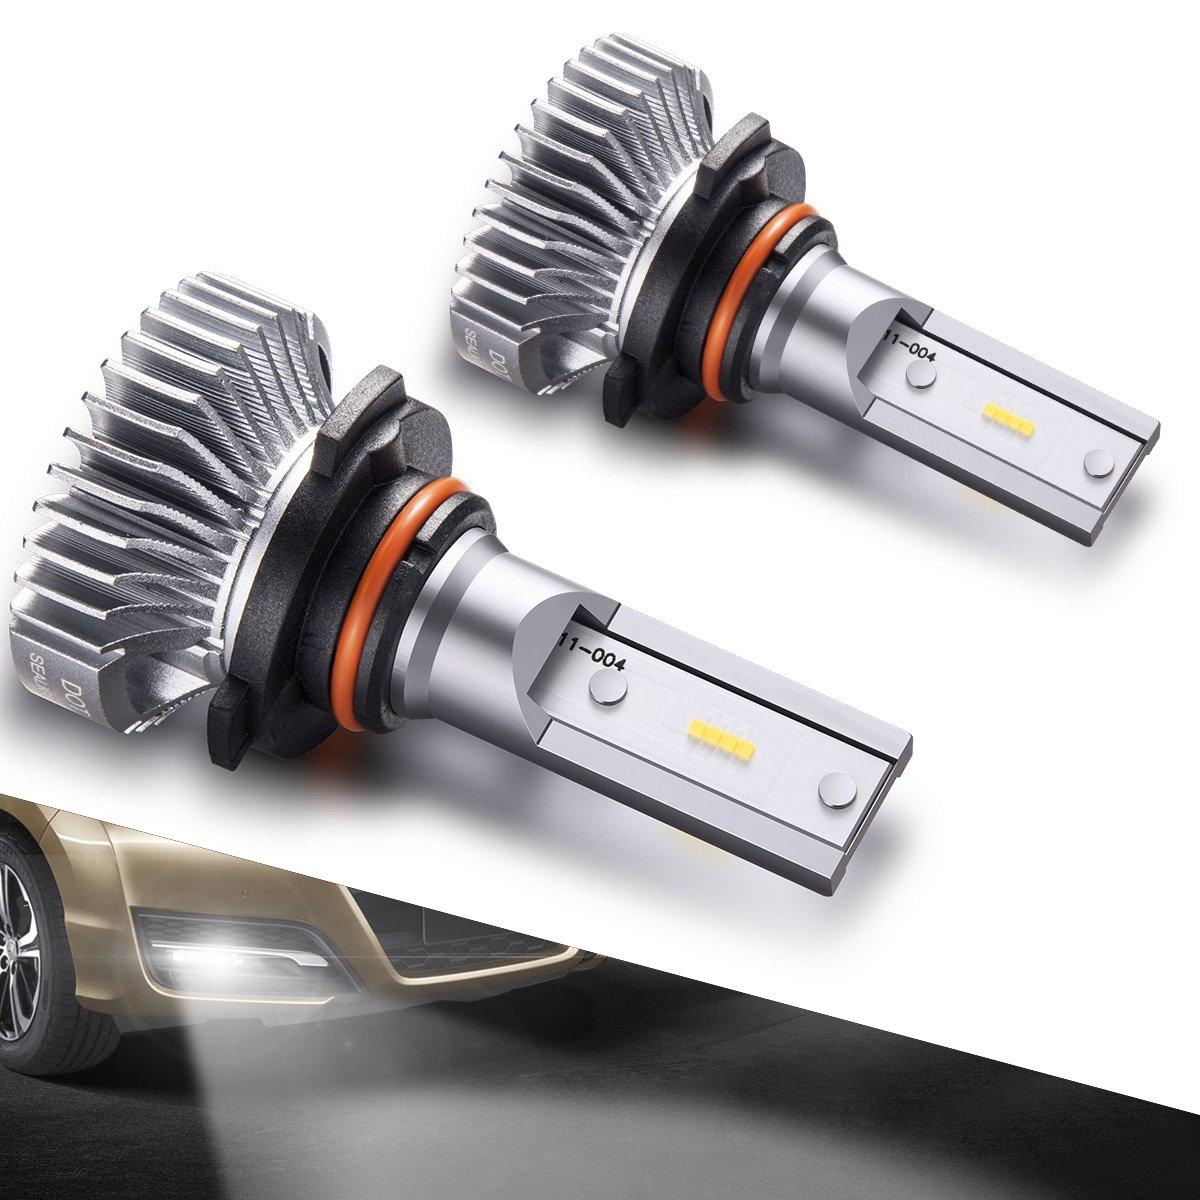 SEALIGHT 9145/9140/9045/9040 LED Fog Lights Bulbs DOT Approved Cool Xenon White 4000 Lumen 6000K Upgrade Extremely Bright Polarity Sensitive (2 Pack)